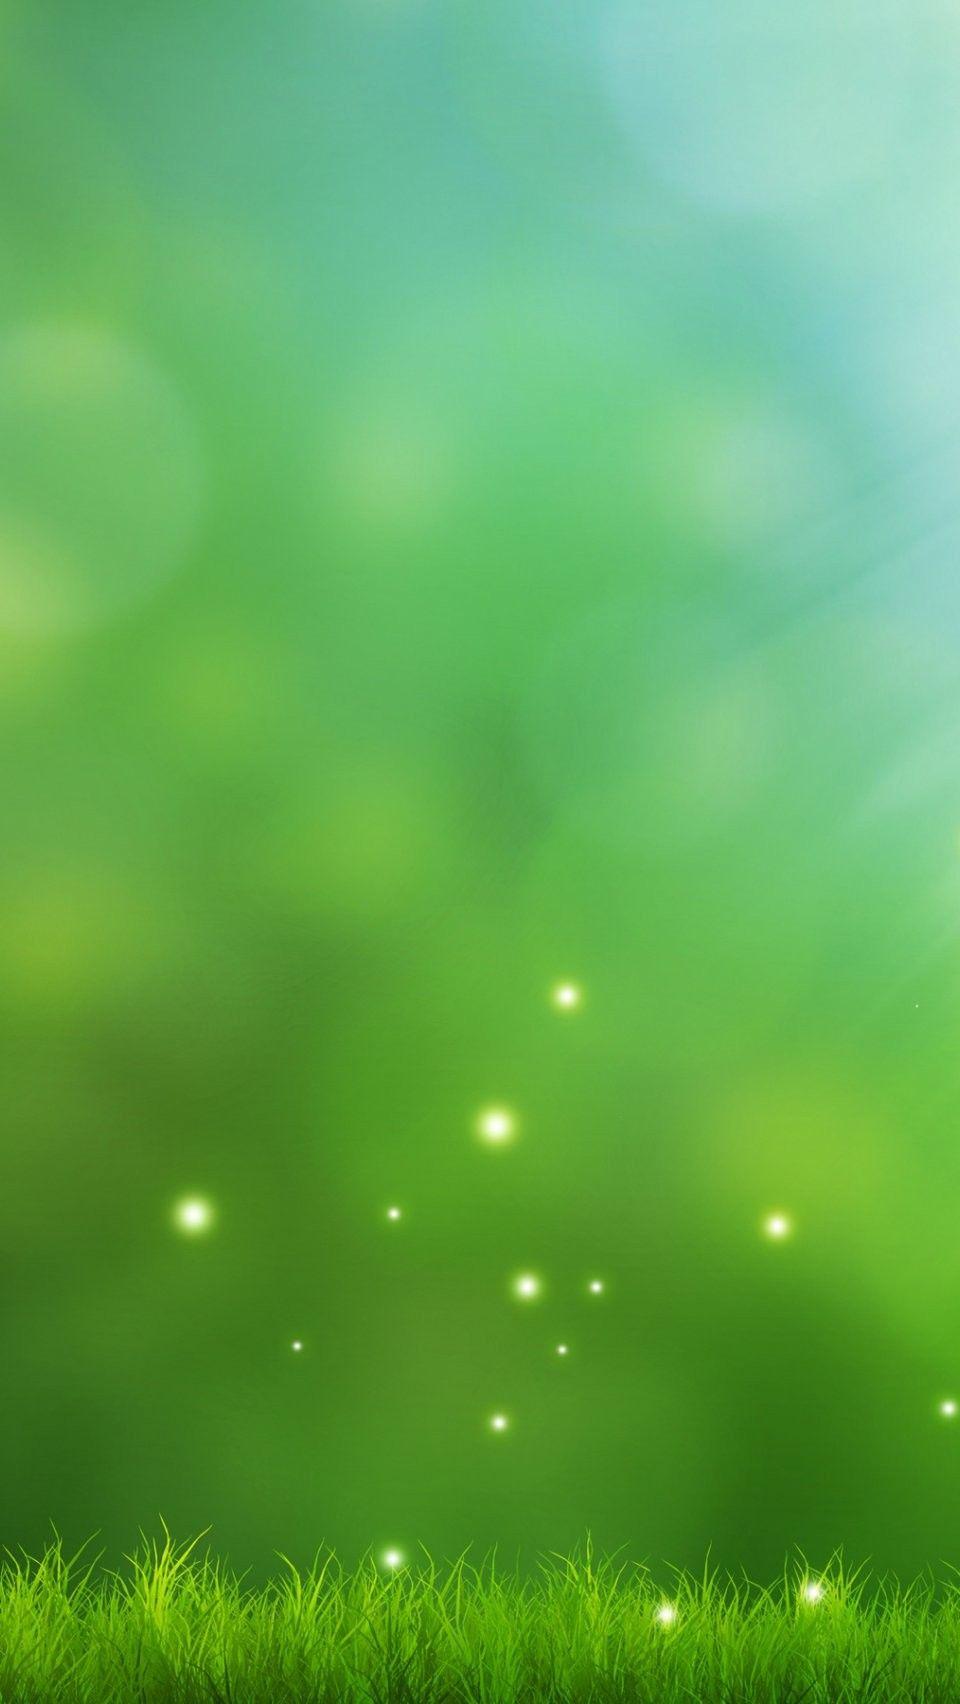 Art Grass White Green Light Sparks Iphone 6 Wallpaper Rendering Iphone 6 Wallpaper Green Wallpaper Phone Abstract Iphone Wallpaper Black Phone Wallpaper